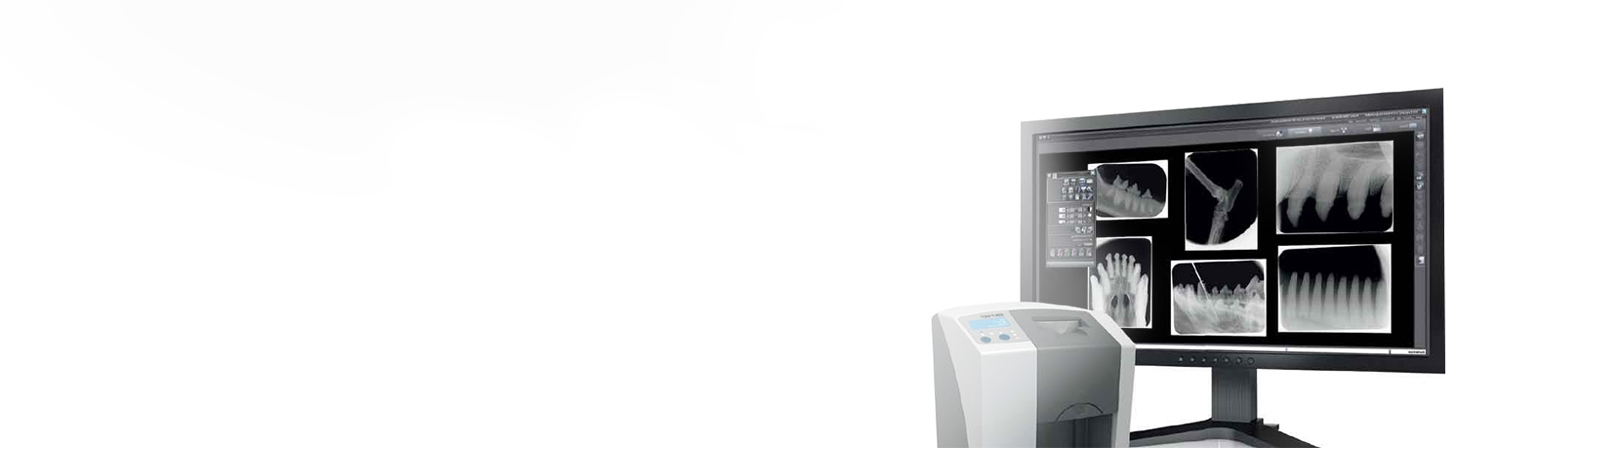 Veterinary Dental Equipment Distributors | iM3 Pty Ltd